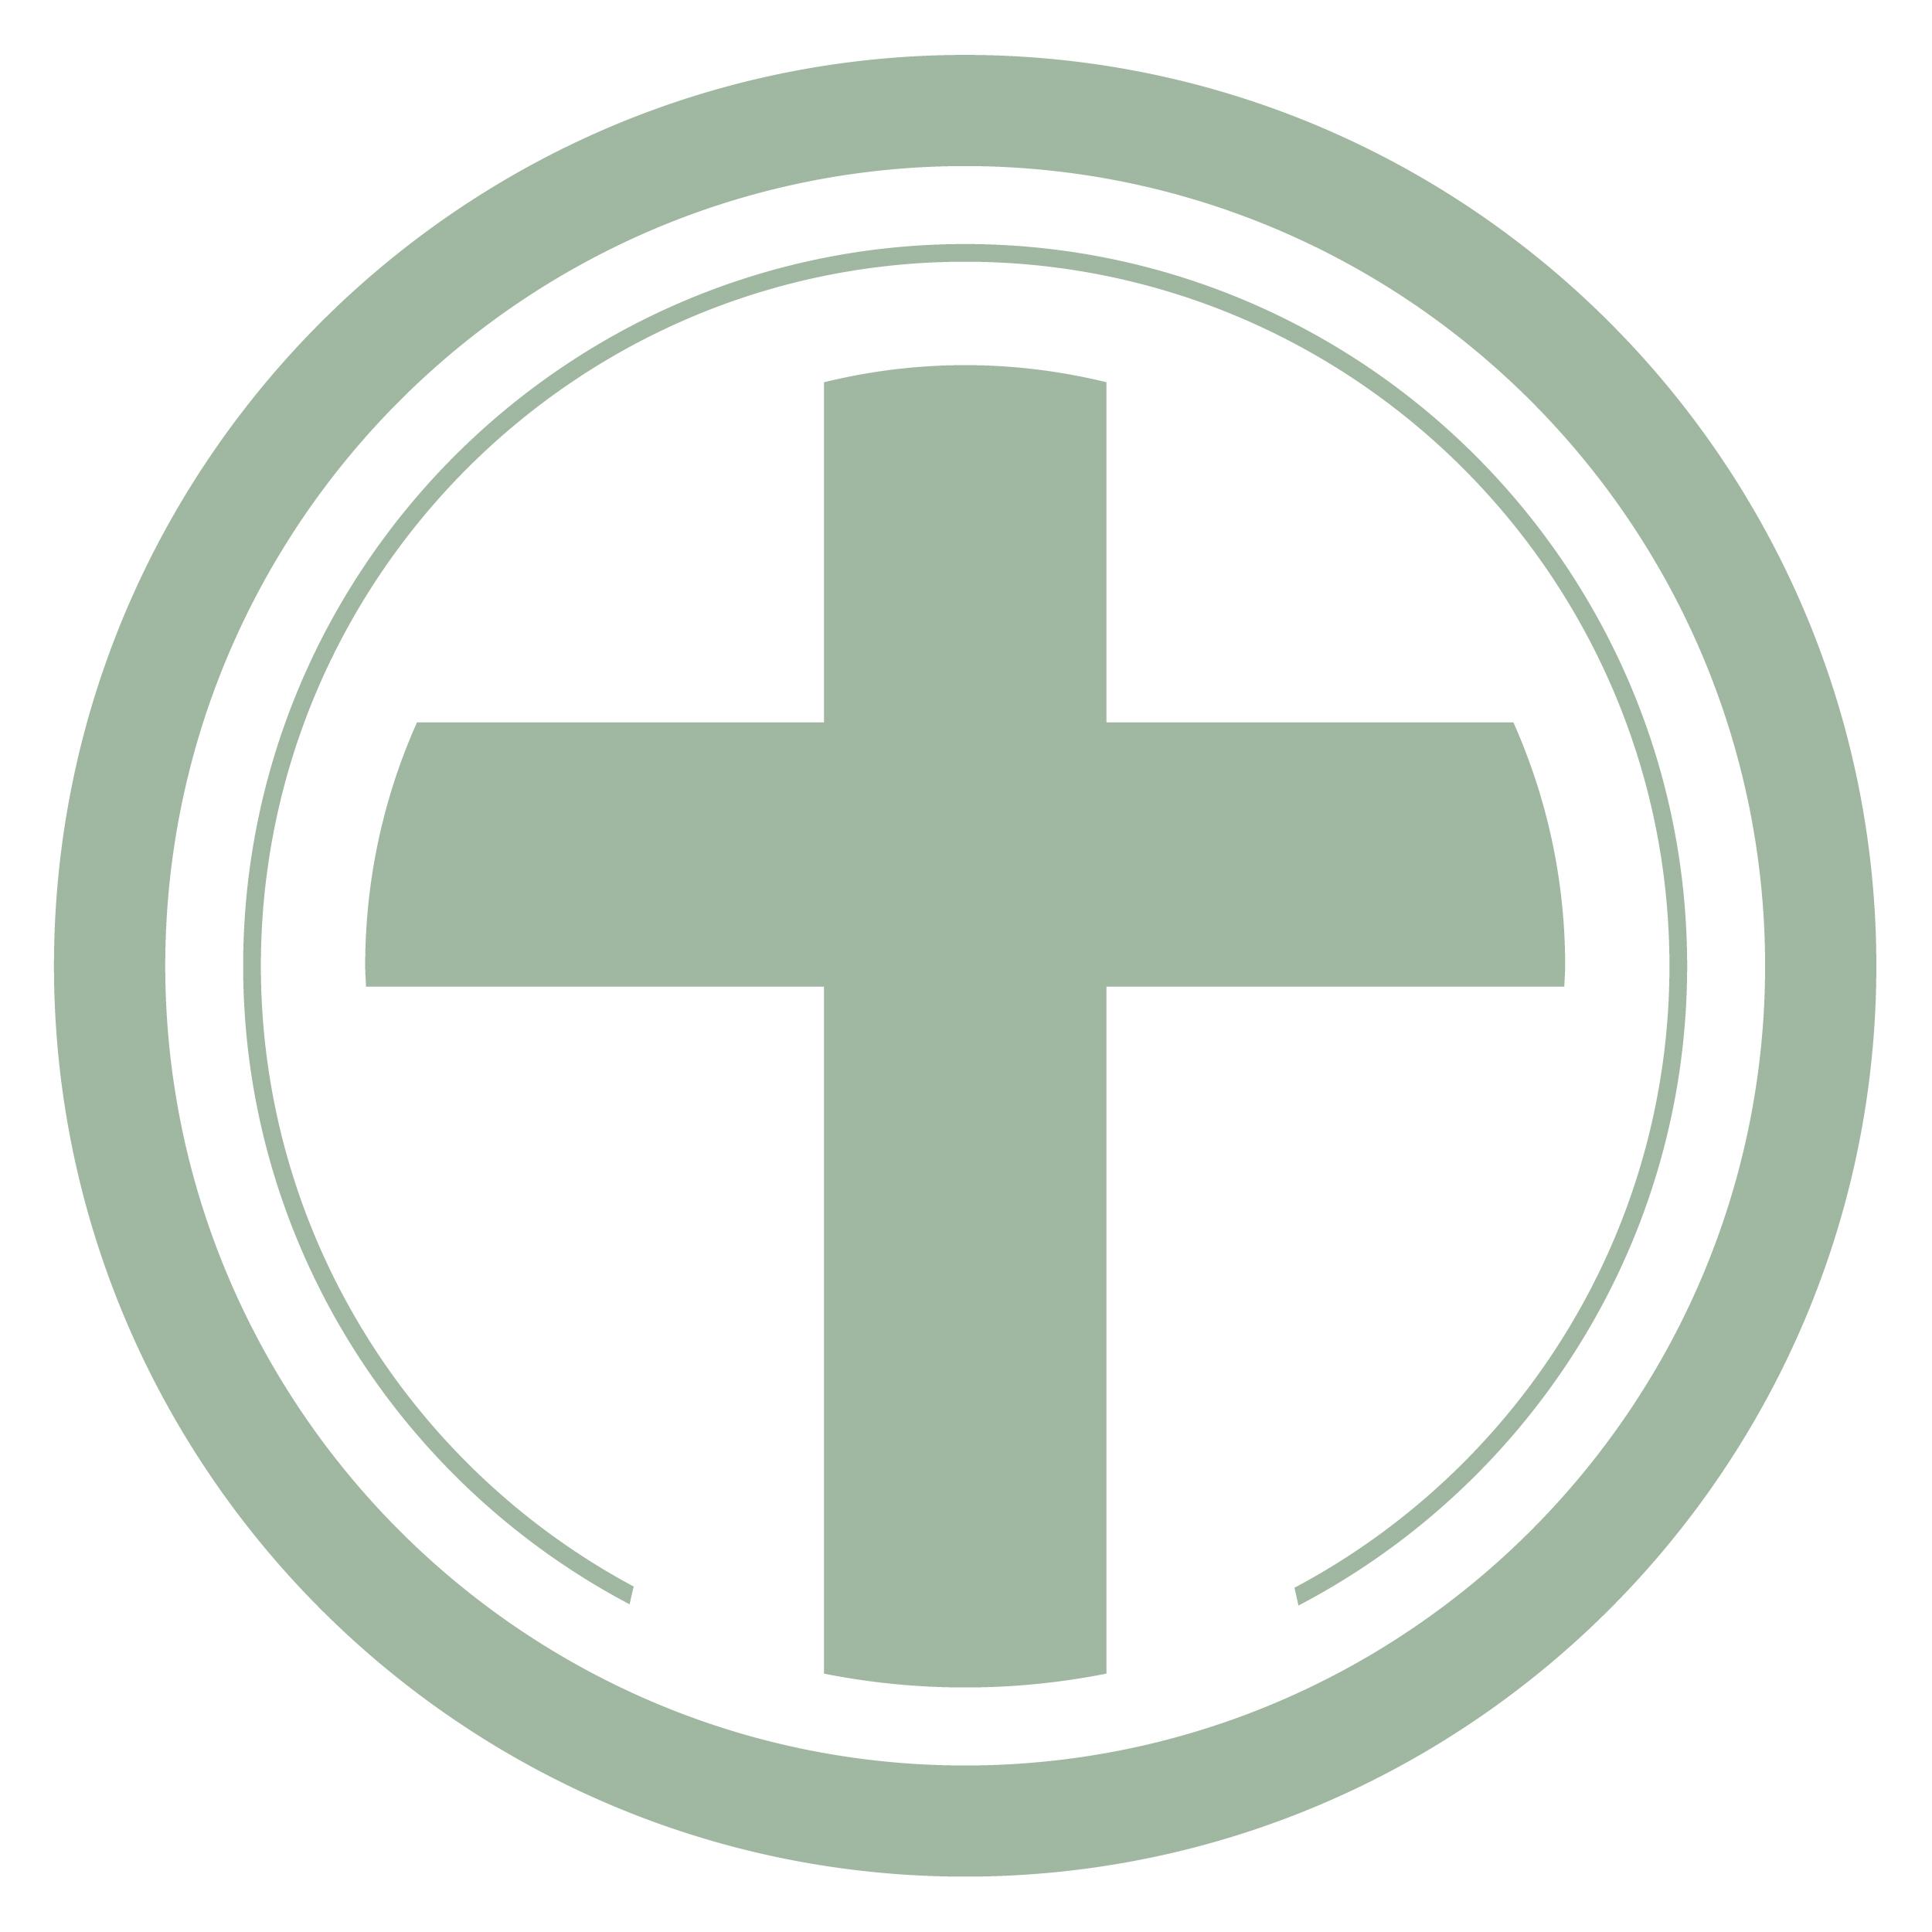 Website:  winchesterbaptist.com  Email:  office@winchesterbaptist.com